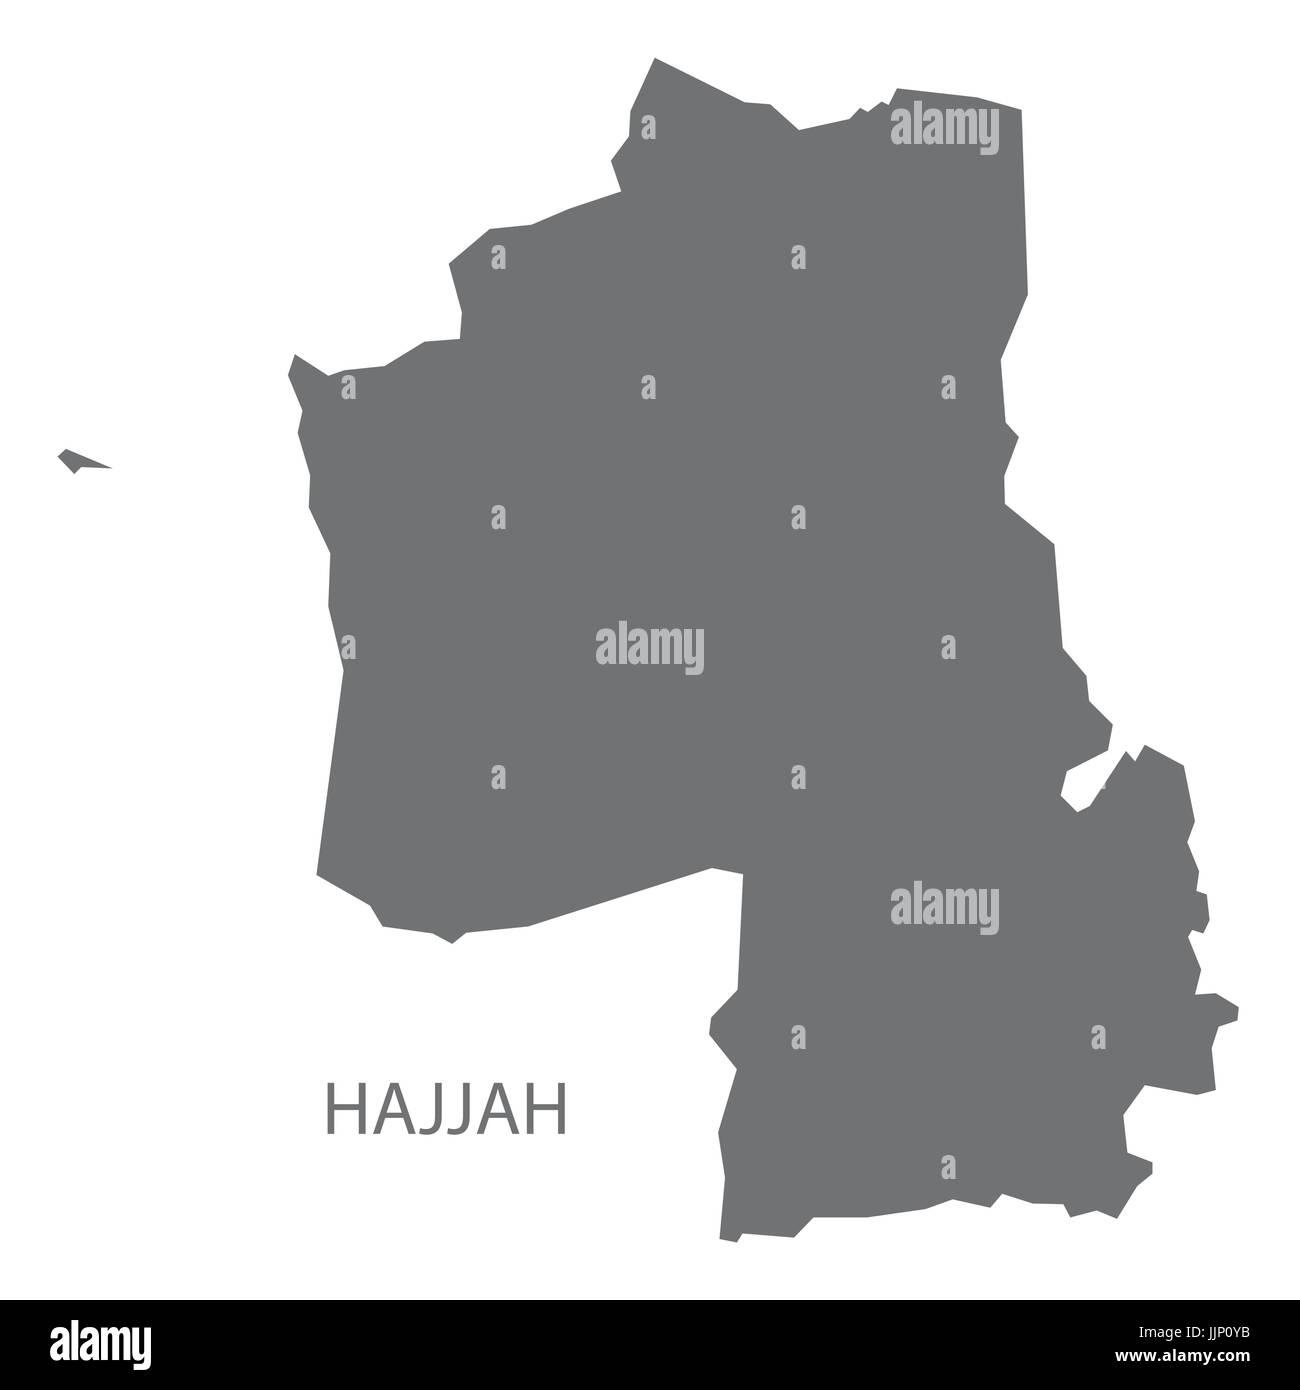 Hajjah Yemen governorate map grey illustration silhouette shape - Stock Vector